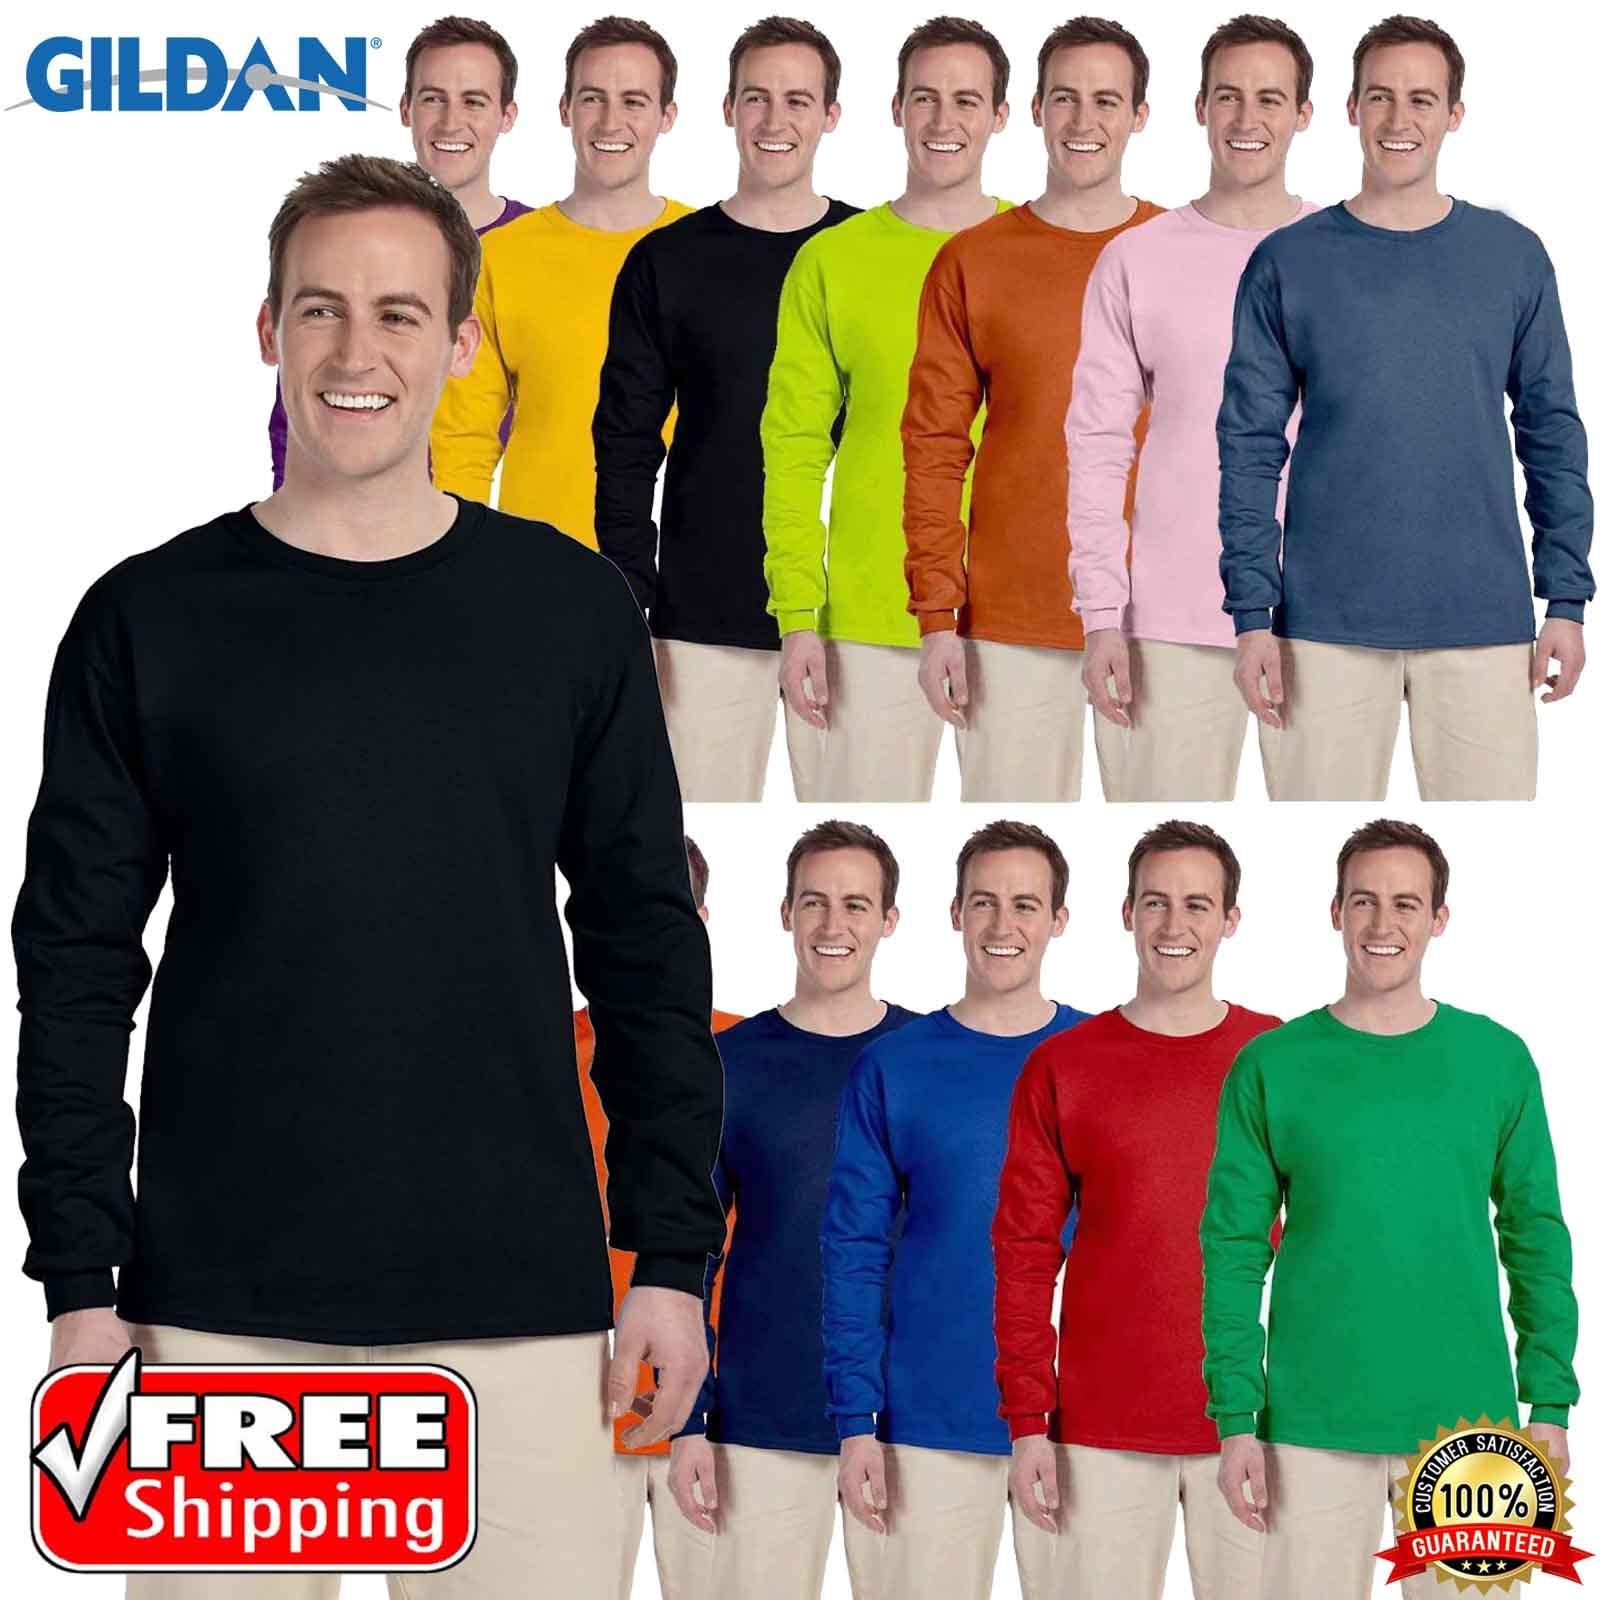 b75588c7 Details about Gildan Heavy Cotton Long Sleeves Mens Blank T-Shirt S-XL  Plain T Shirt Tee G240